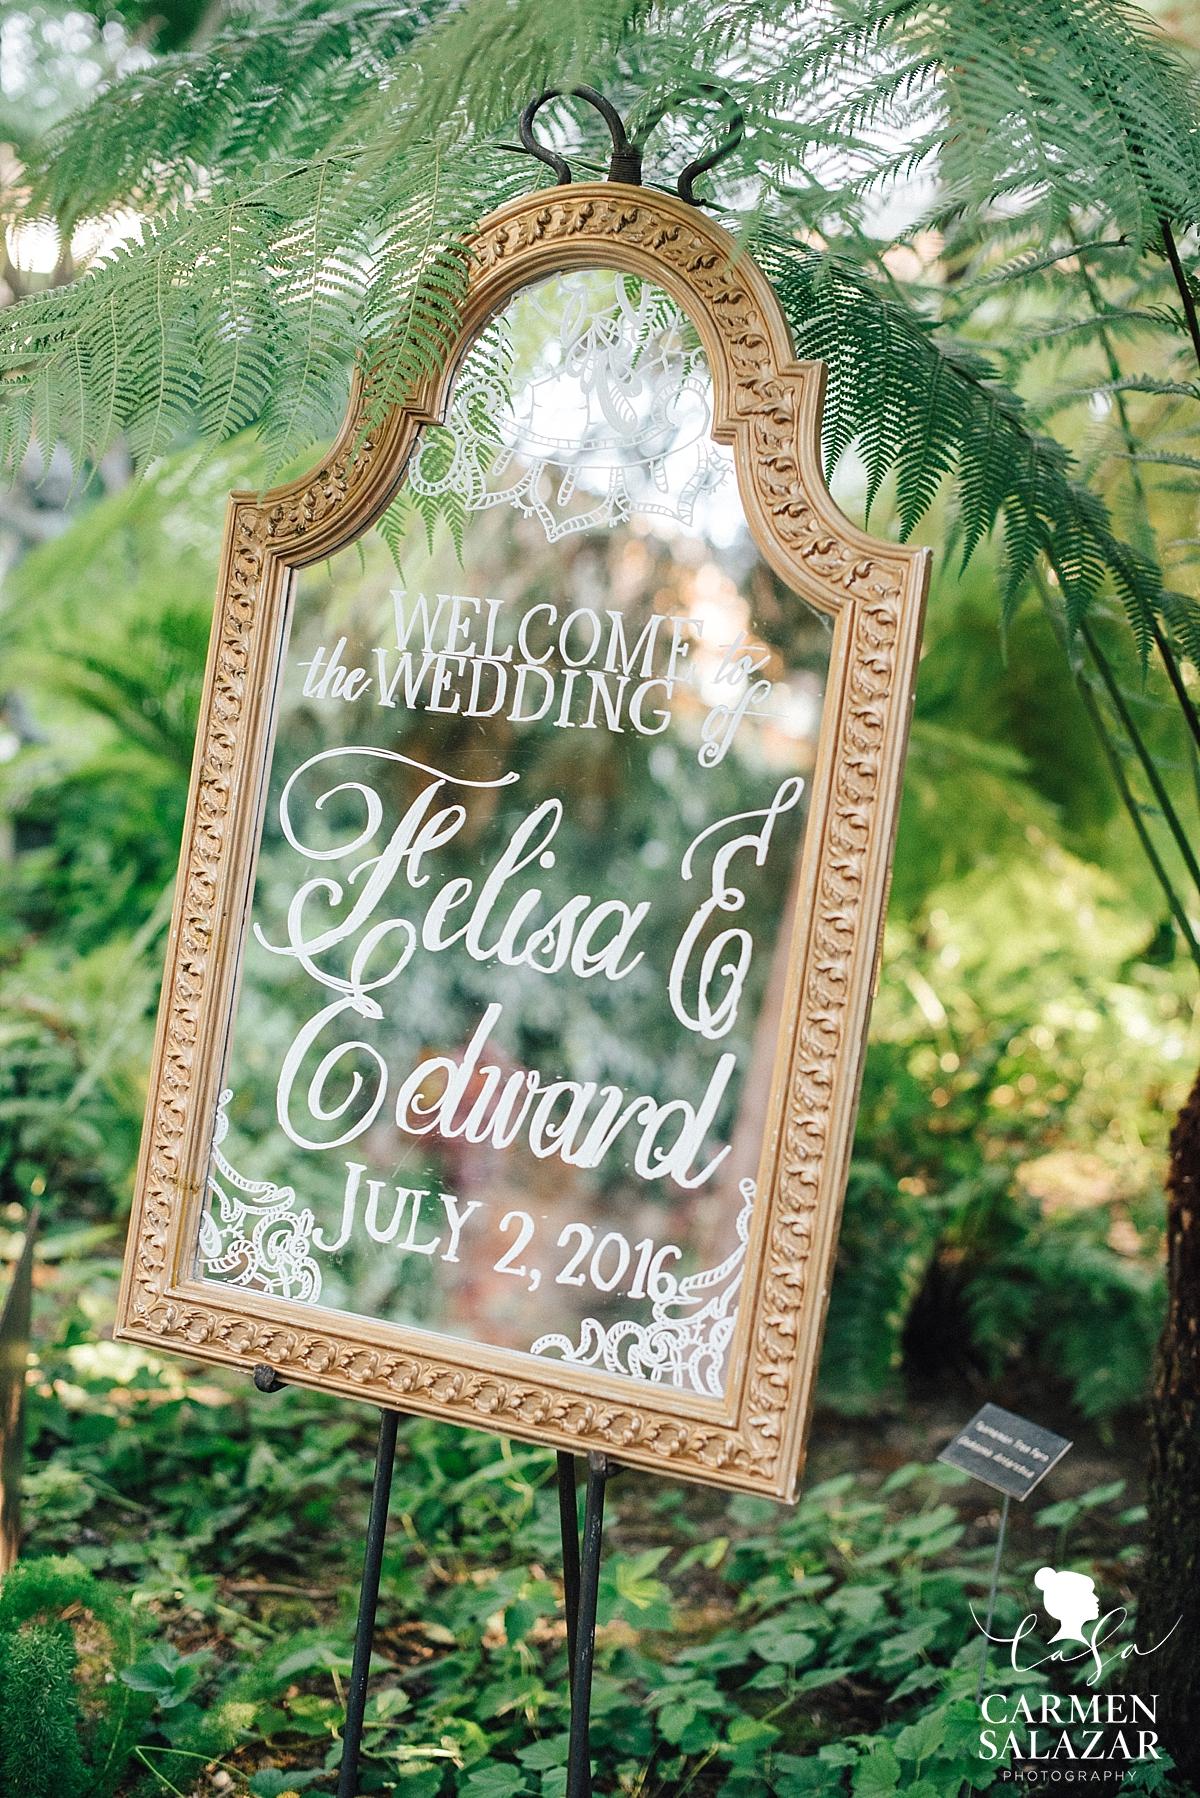 Boho inspired brass wedding mirror sign - Carmen Salazar